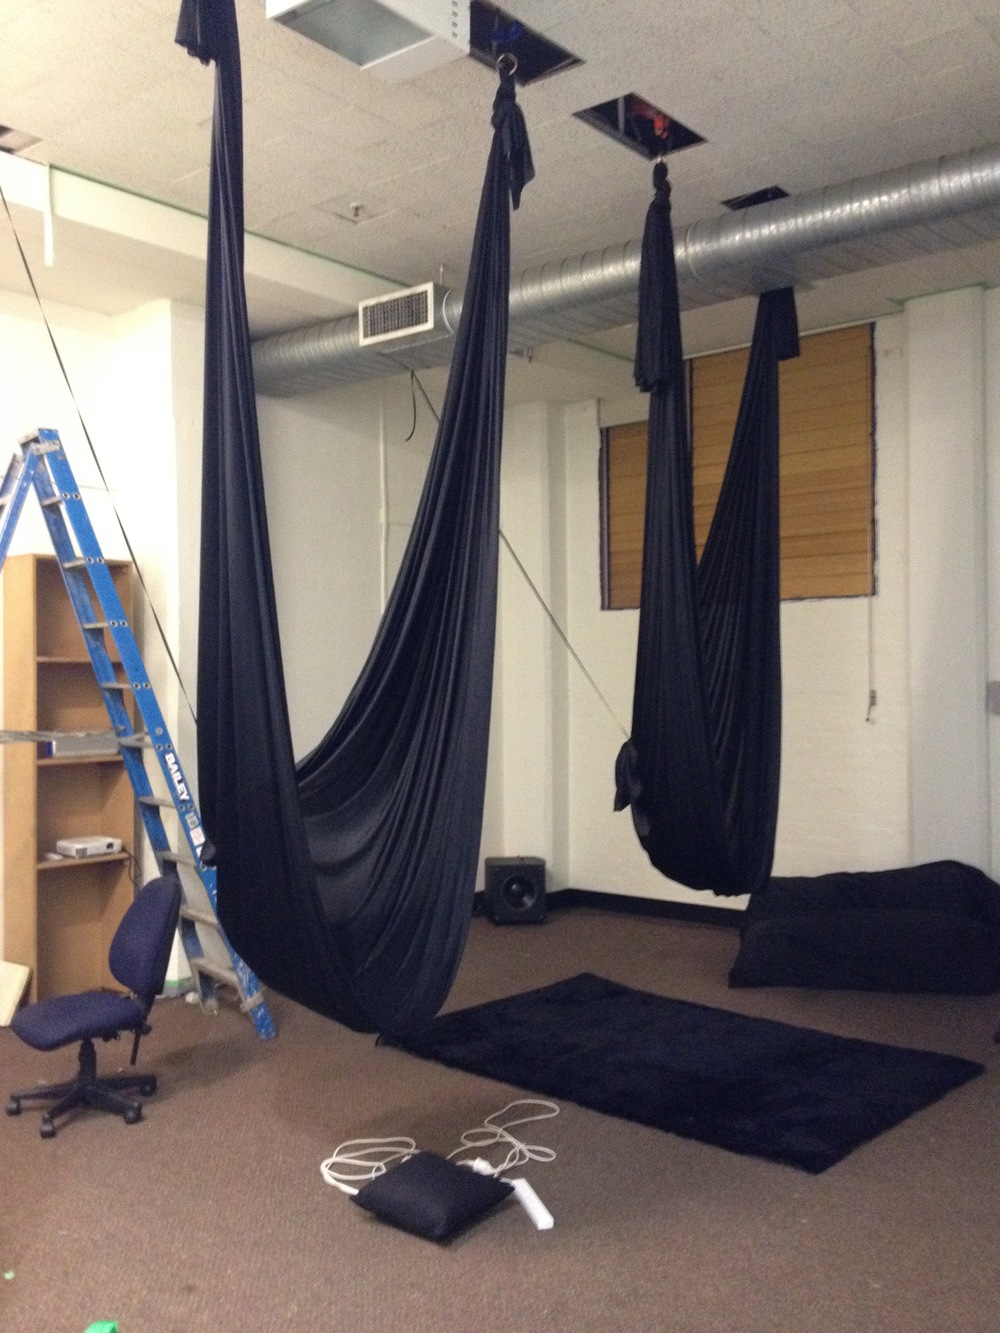 Testing ceiling-based rig for 'GovHack' in July 2015